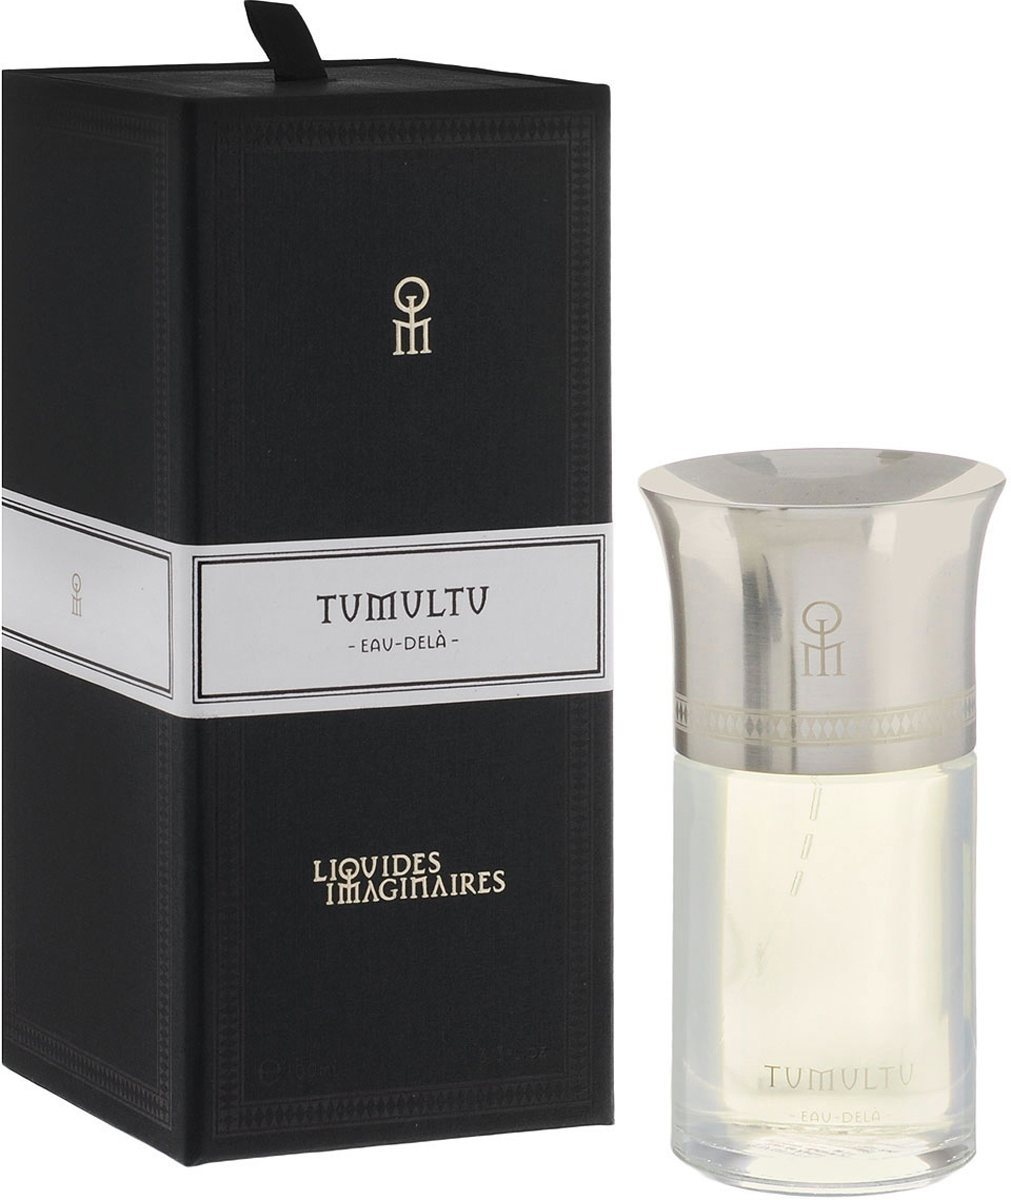 Les Liquides Imaginaires Парфюмерная вода Tumultu, унисекс, 100 мл granada парфюмерная вода